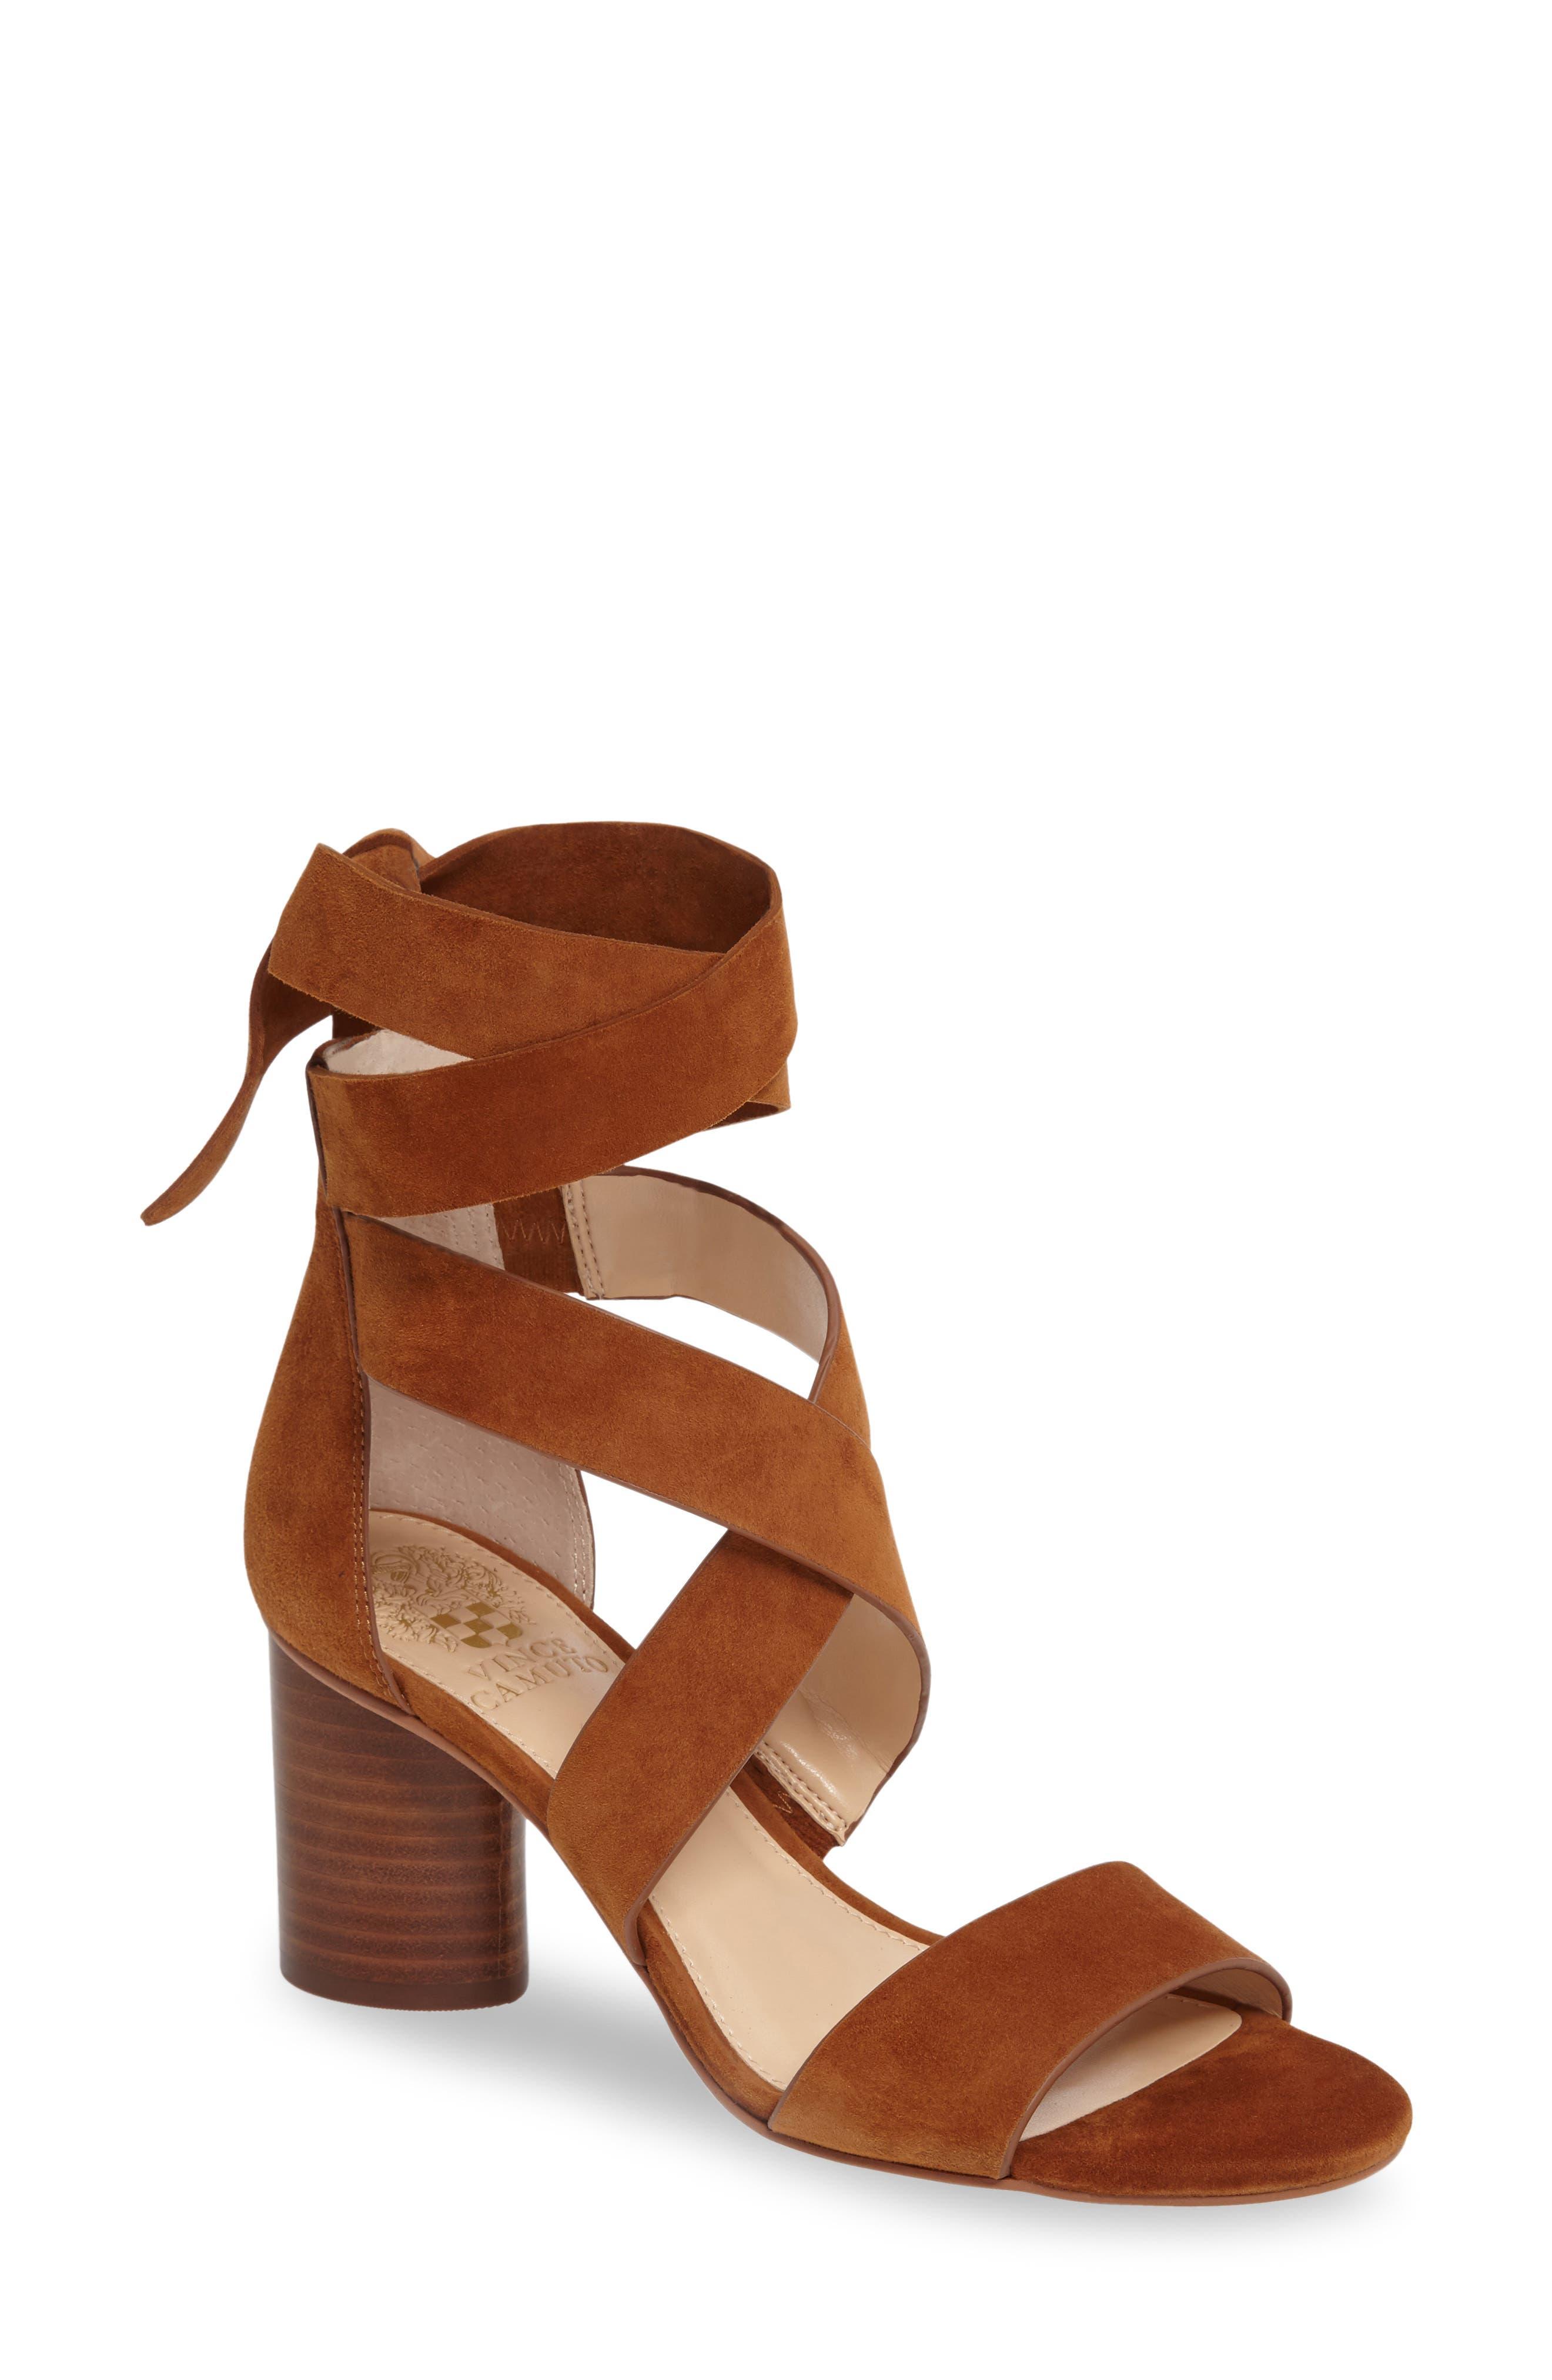 Main Image - Vince Camuto Jeneve Block Heel Sandal (Women)